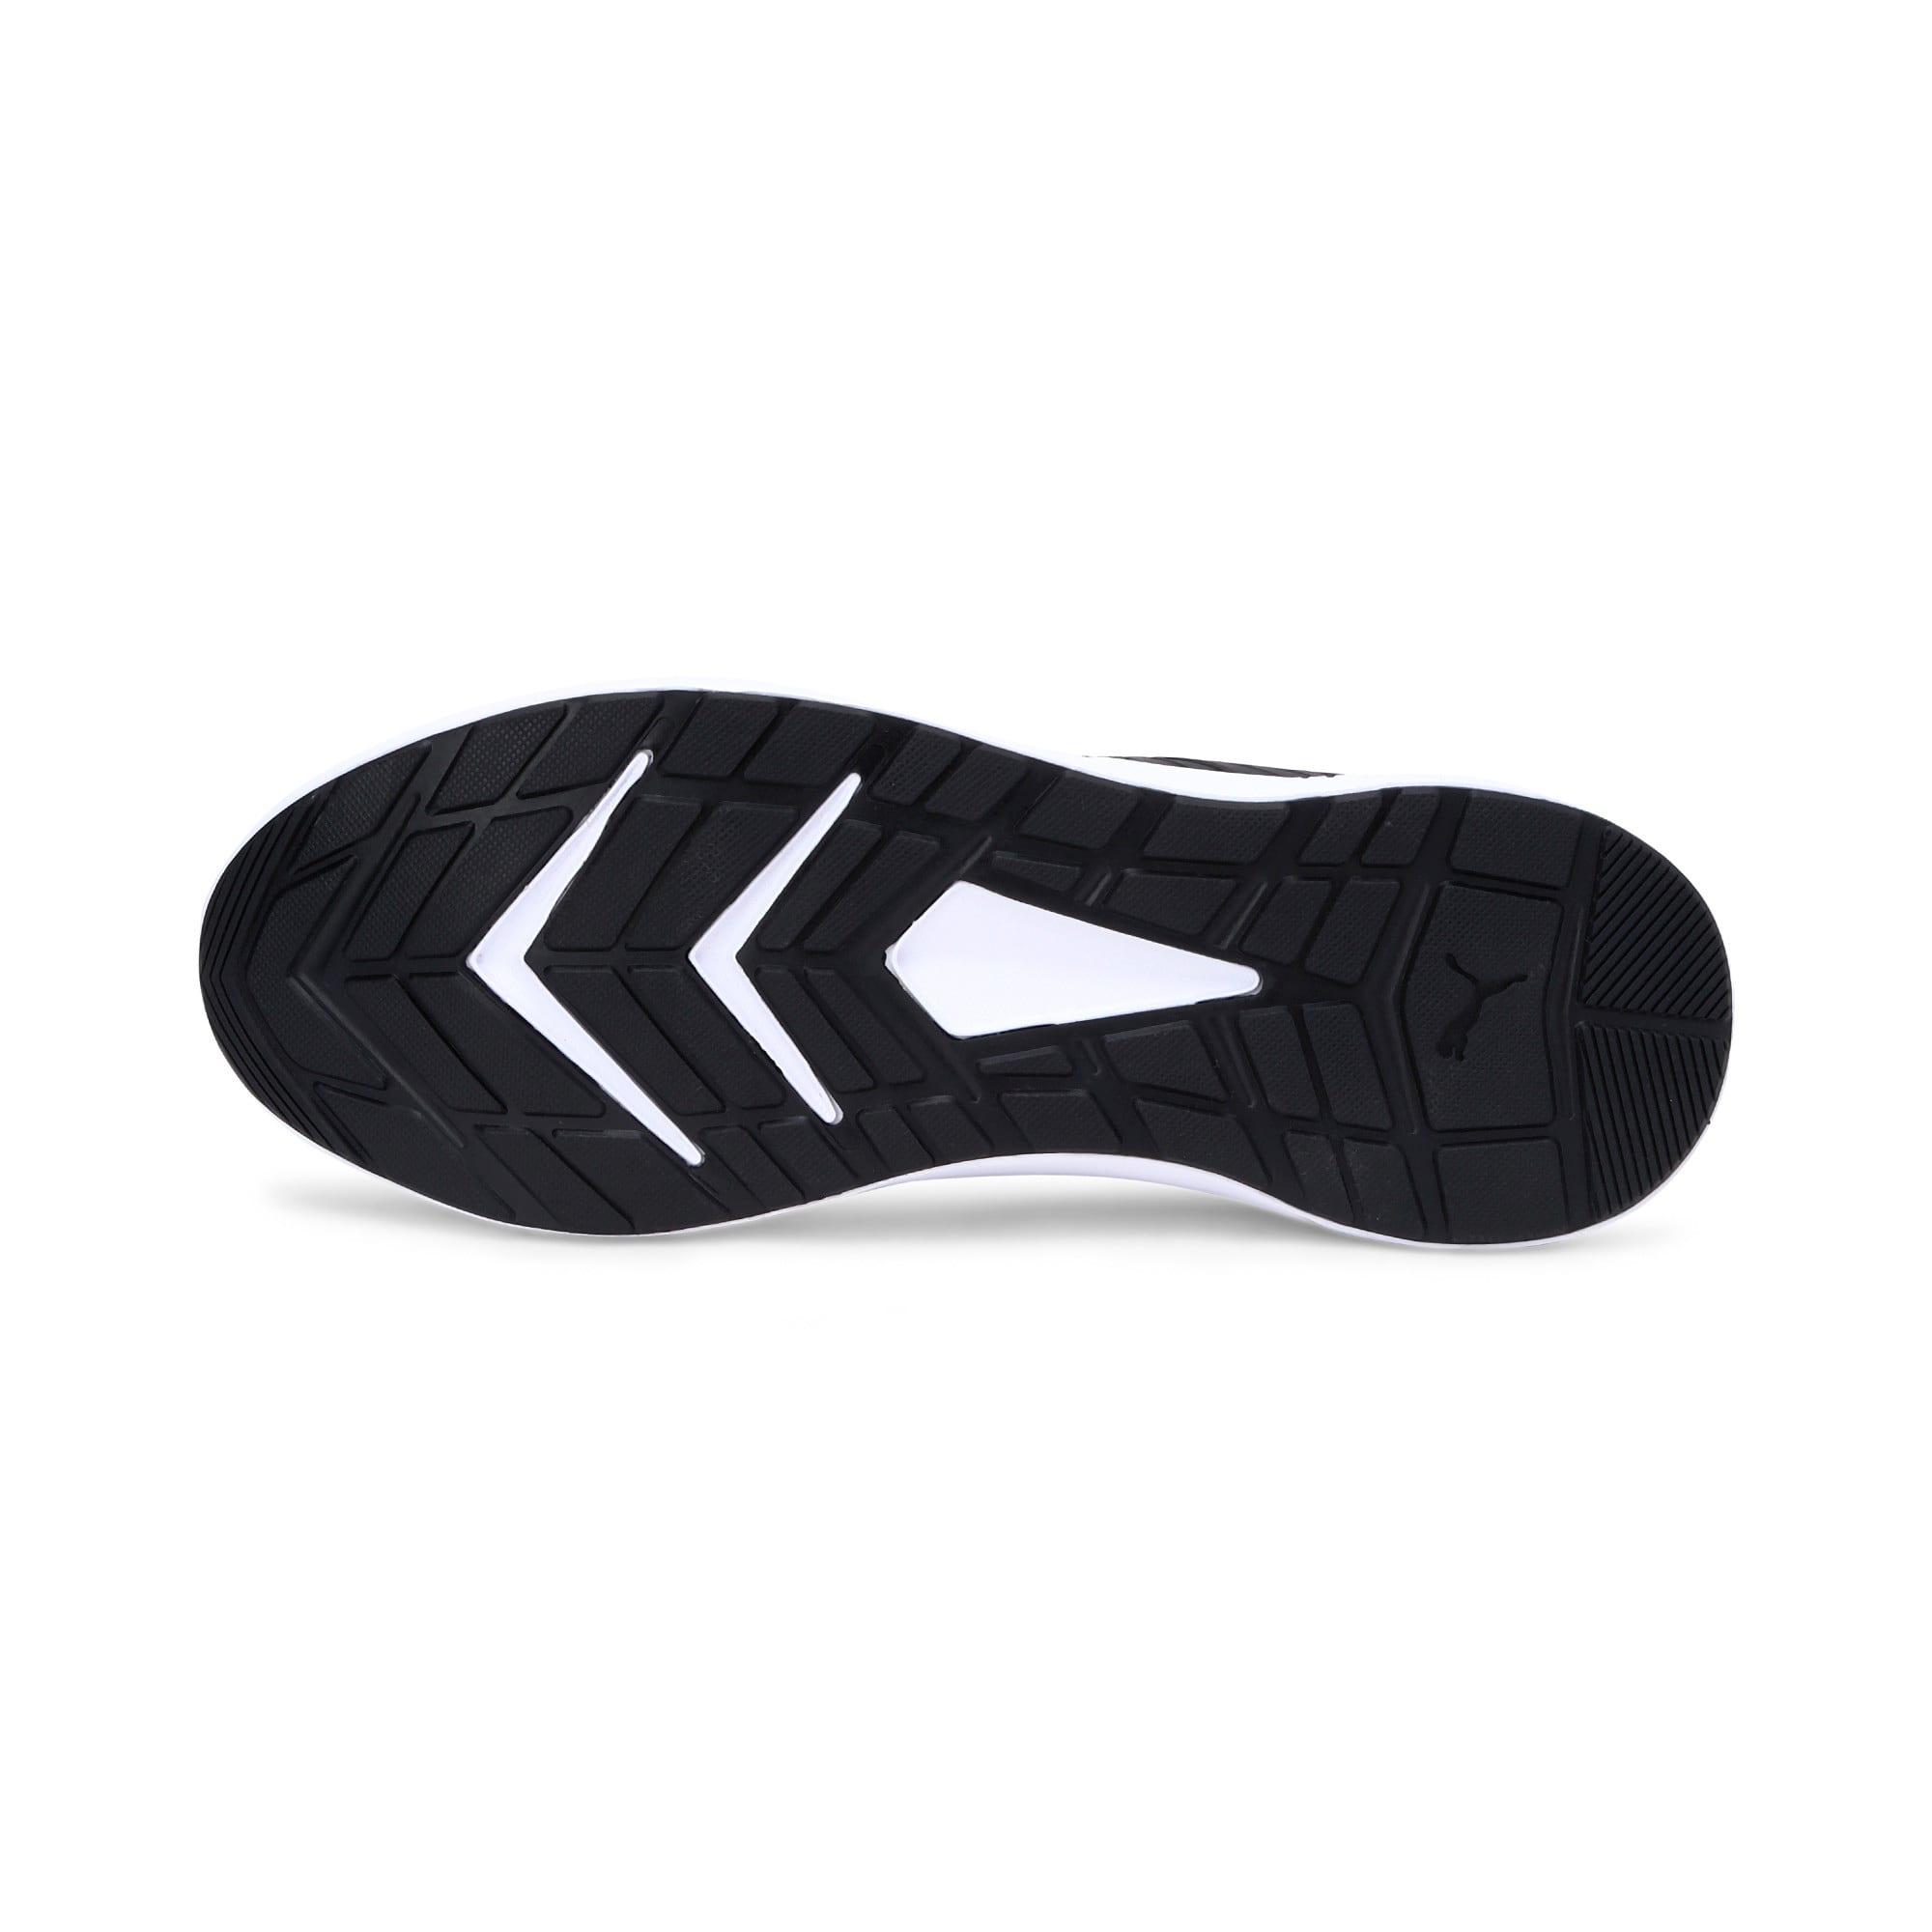 Thumbnail 4 of Escaper Training Shoes, Puma Black-Puma White, medium-IND